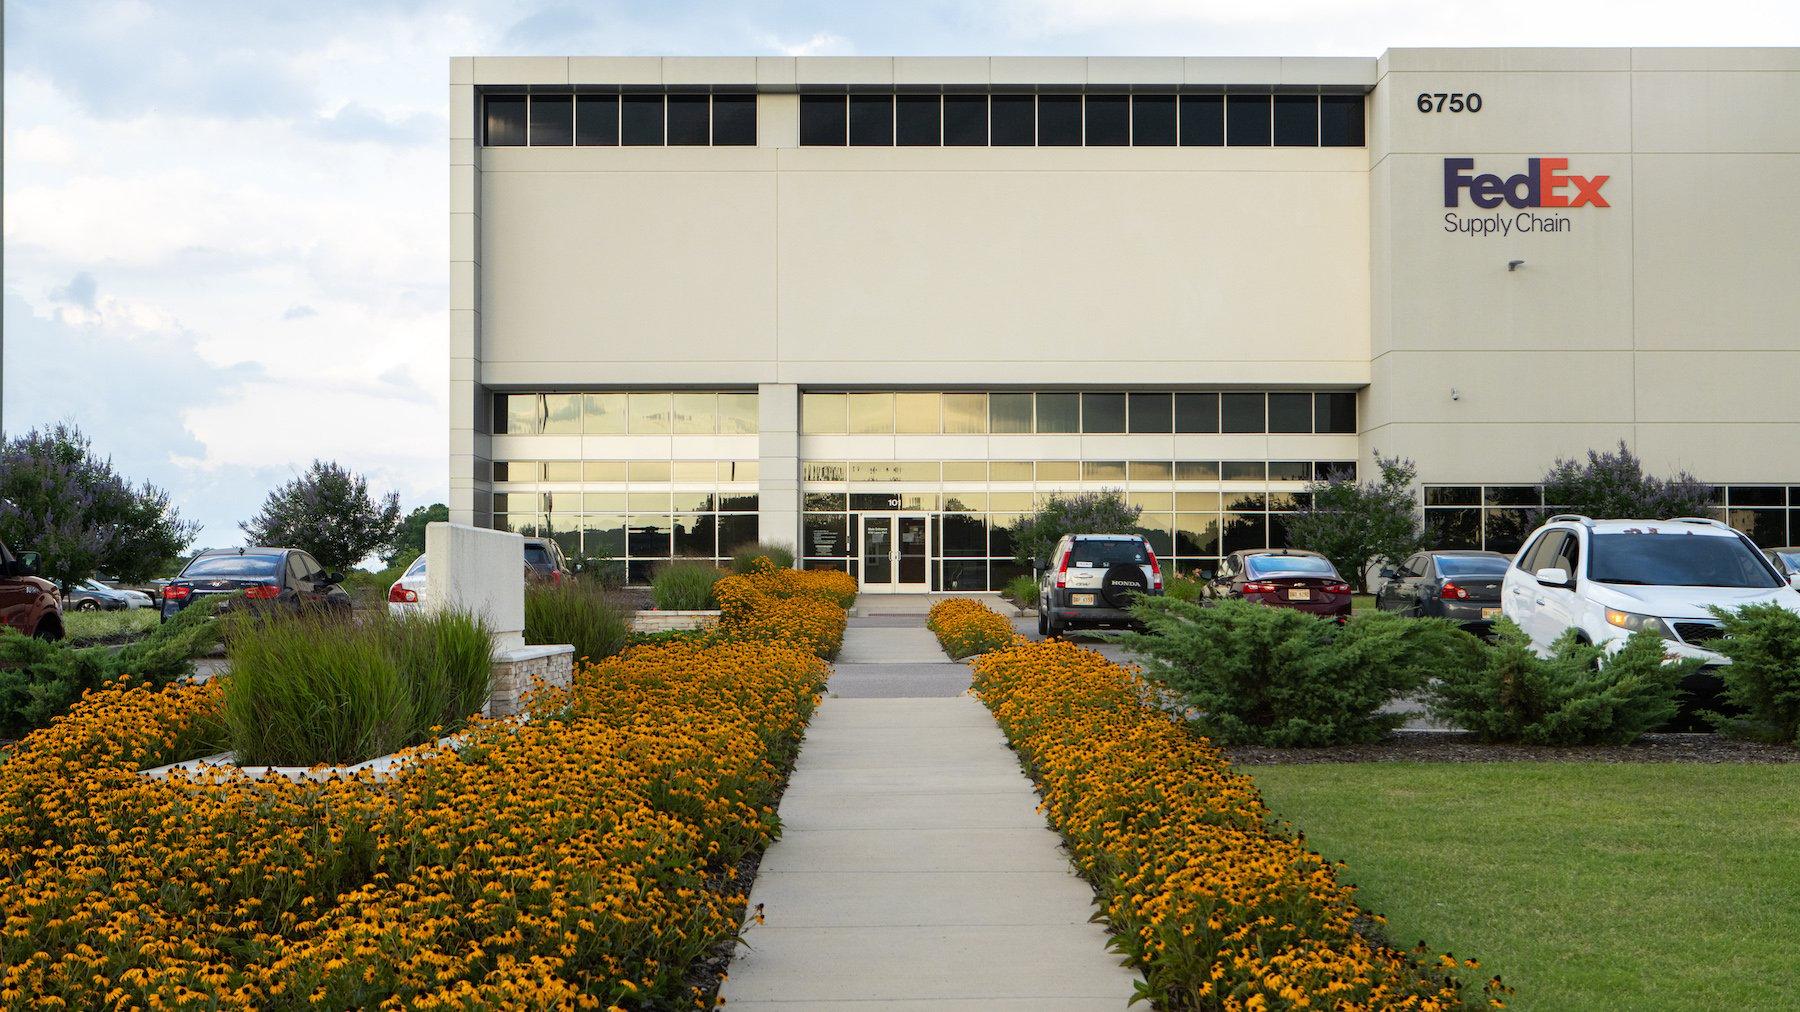 FedEx Warehouse with perennial plantings along sidewalk